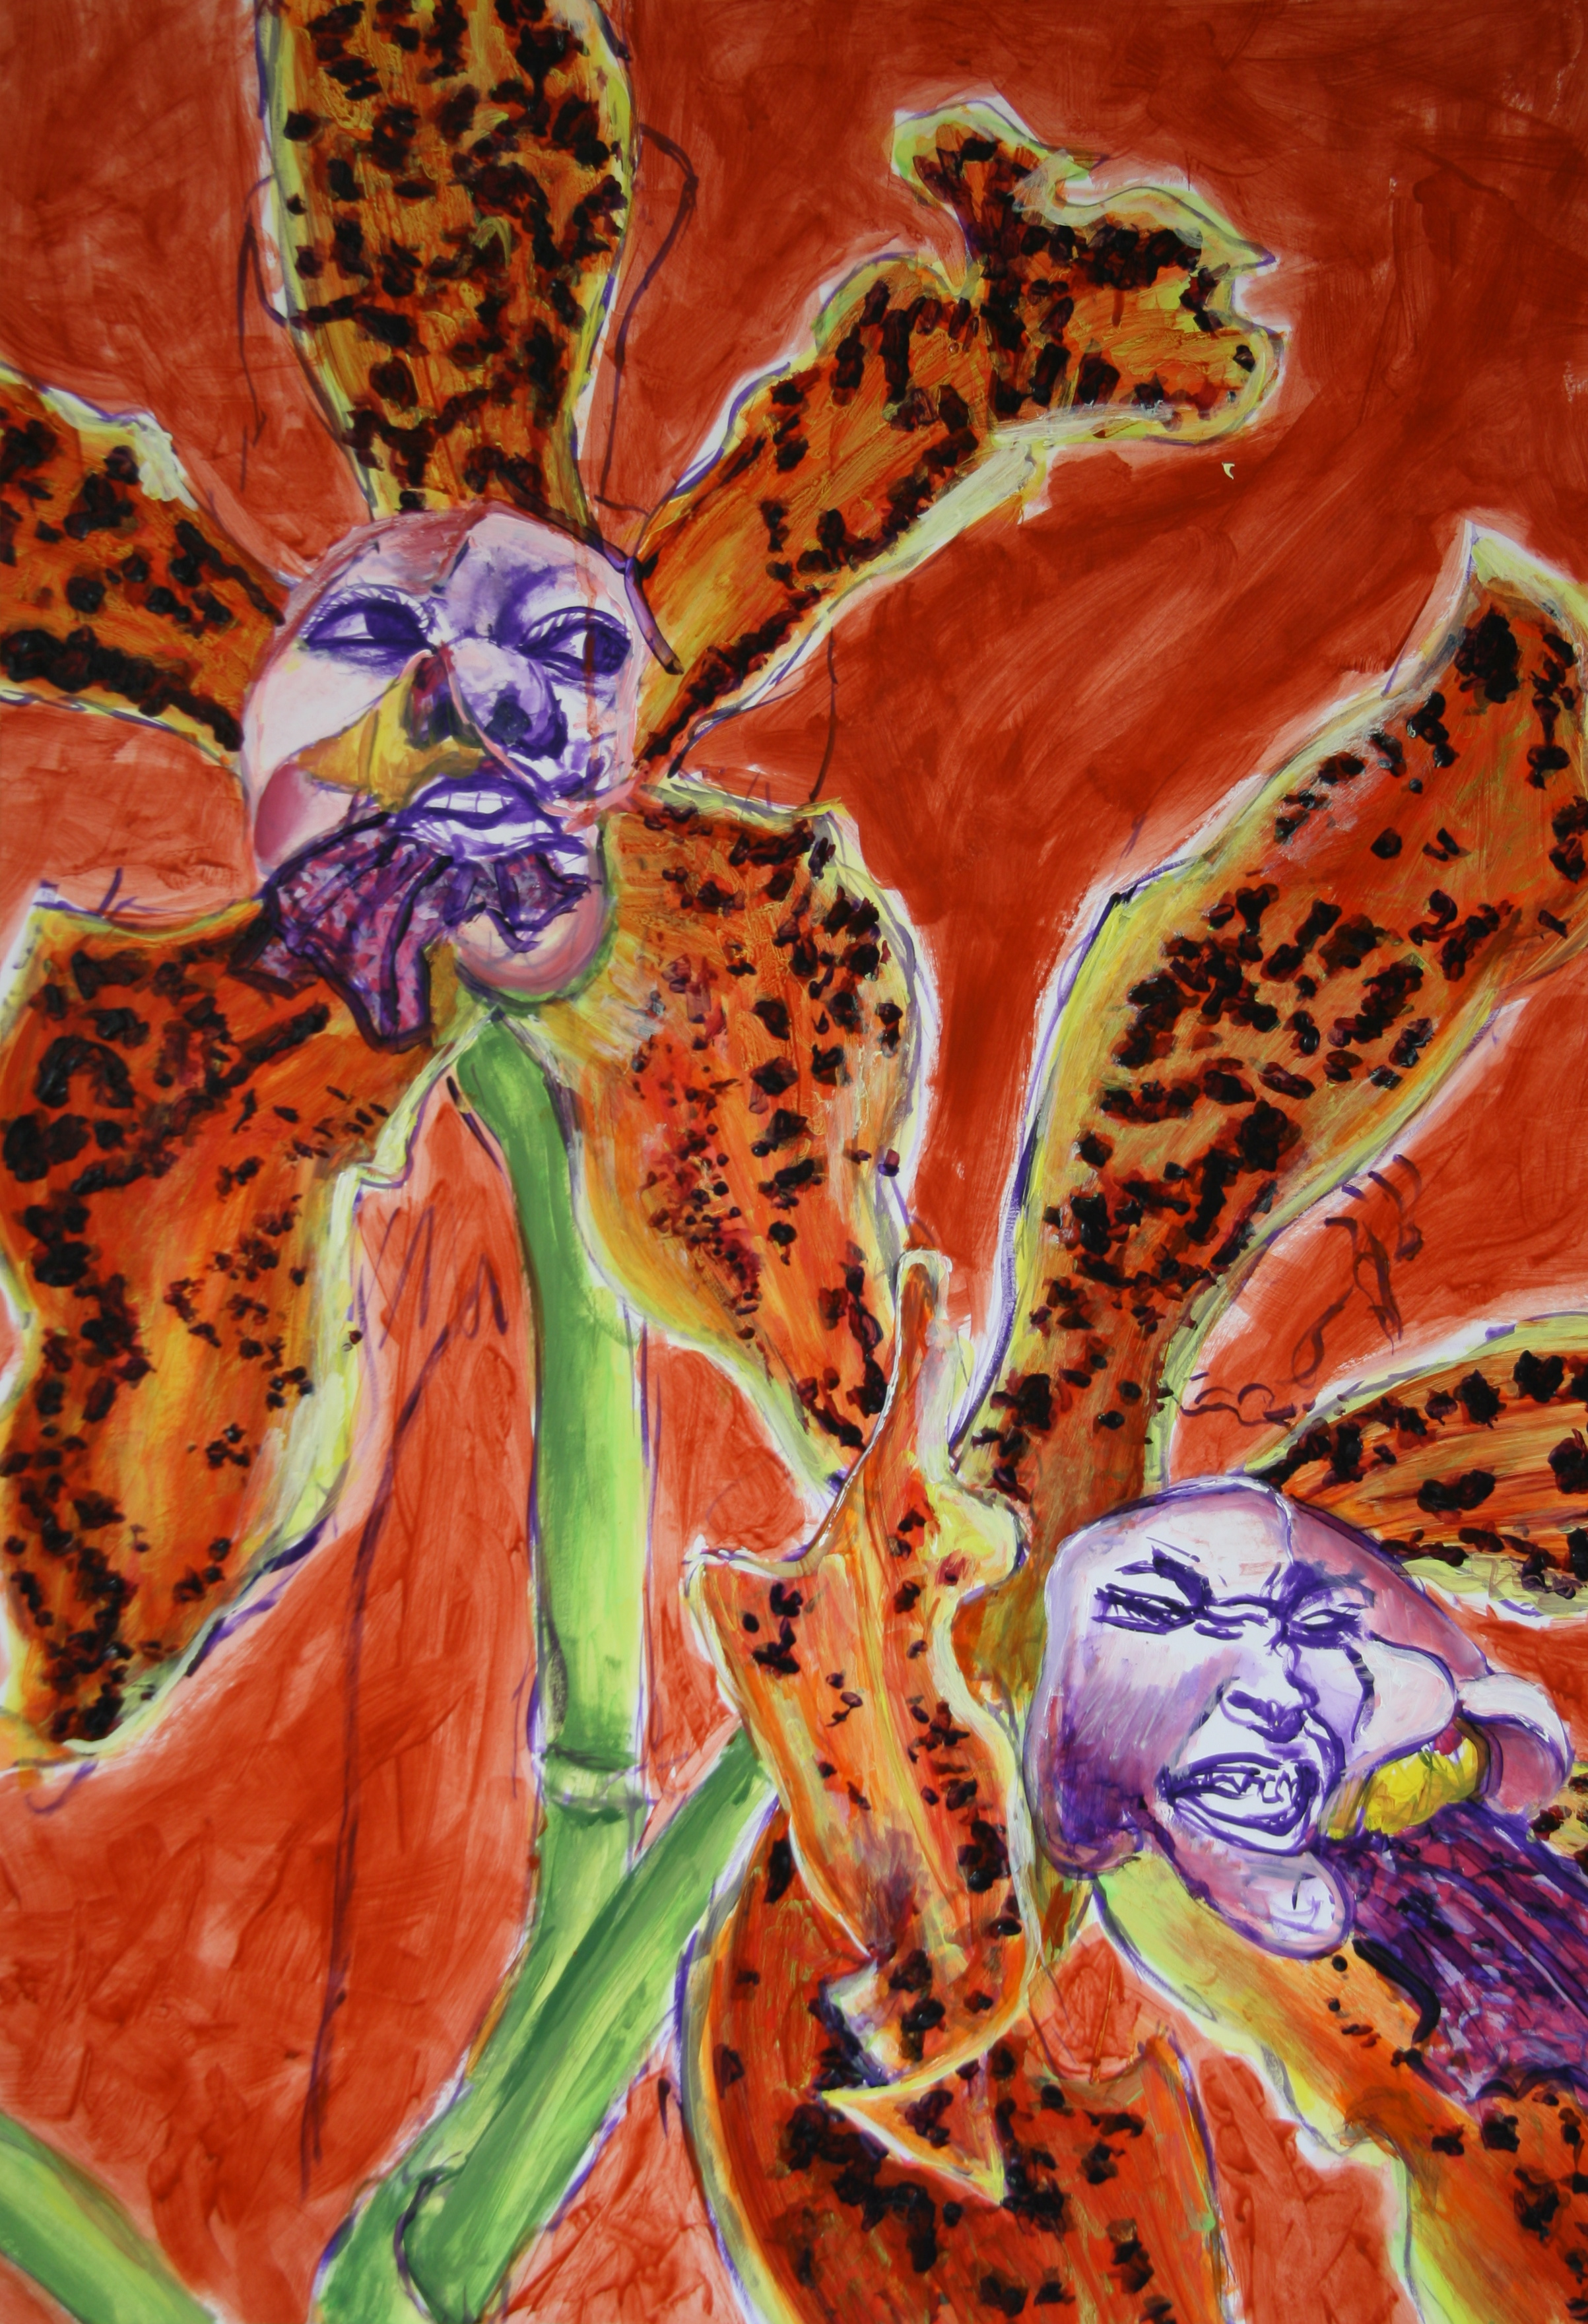 Die Begeisterte Blume 6, 100x70cm, acrylic on paper